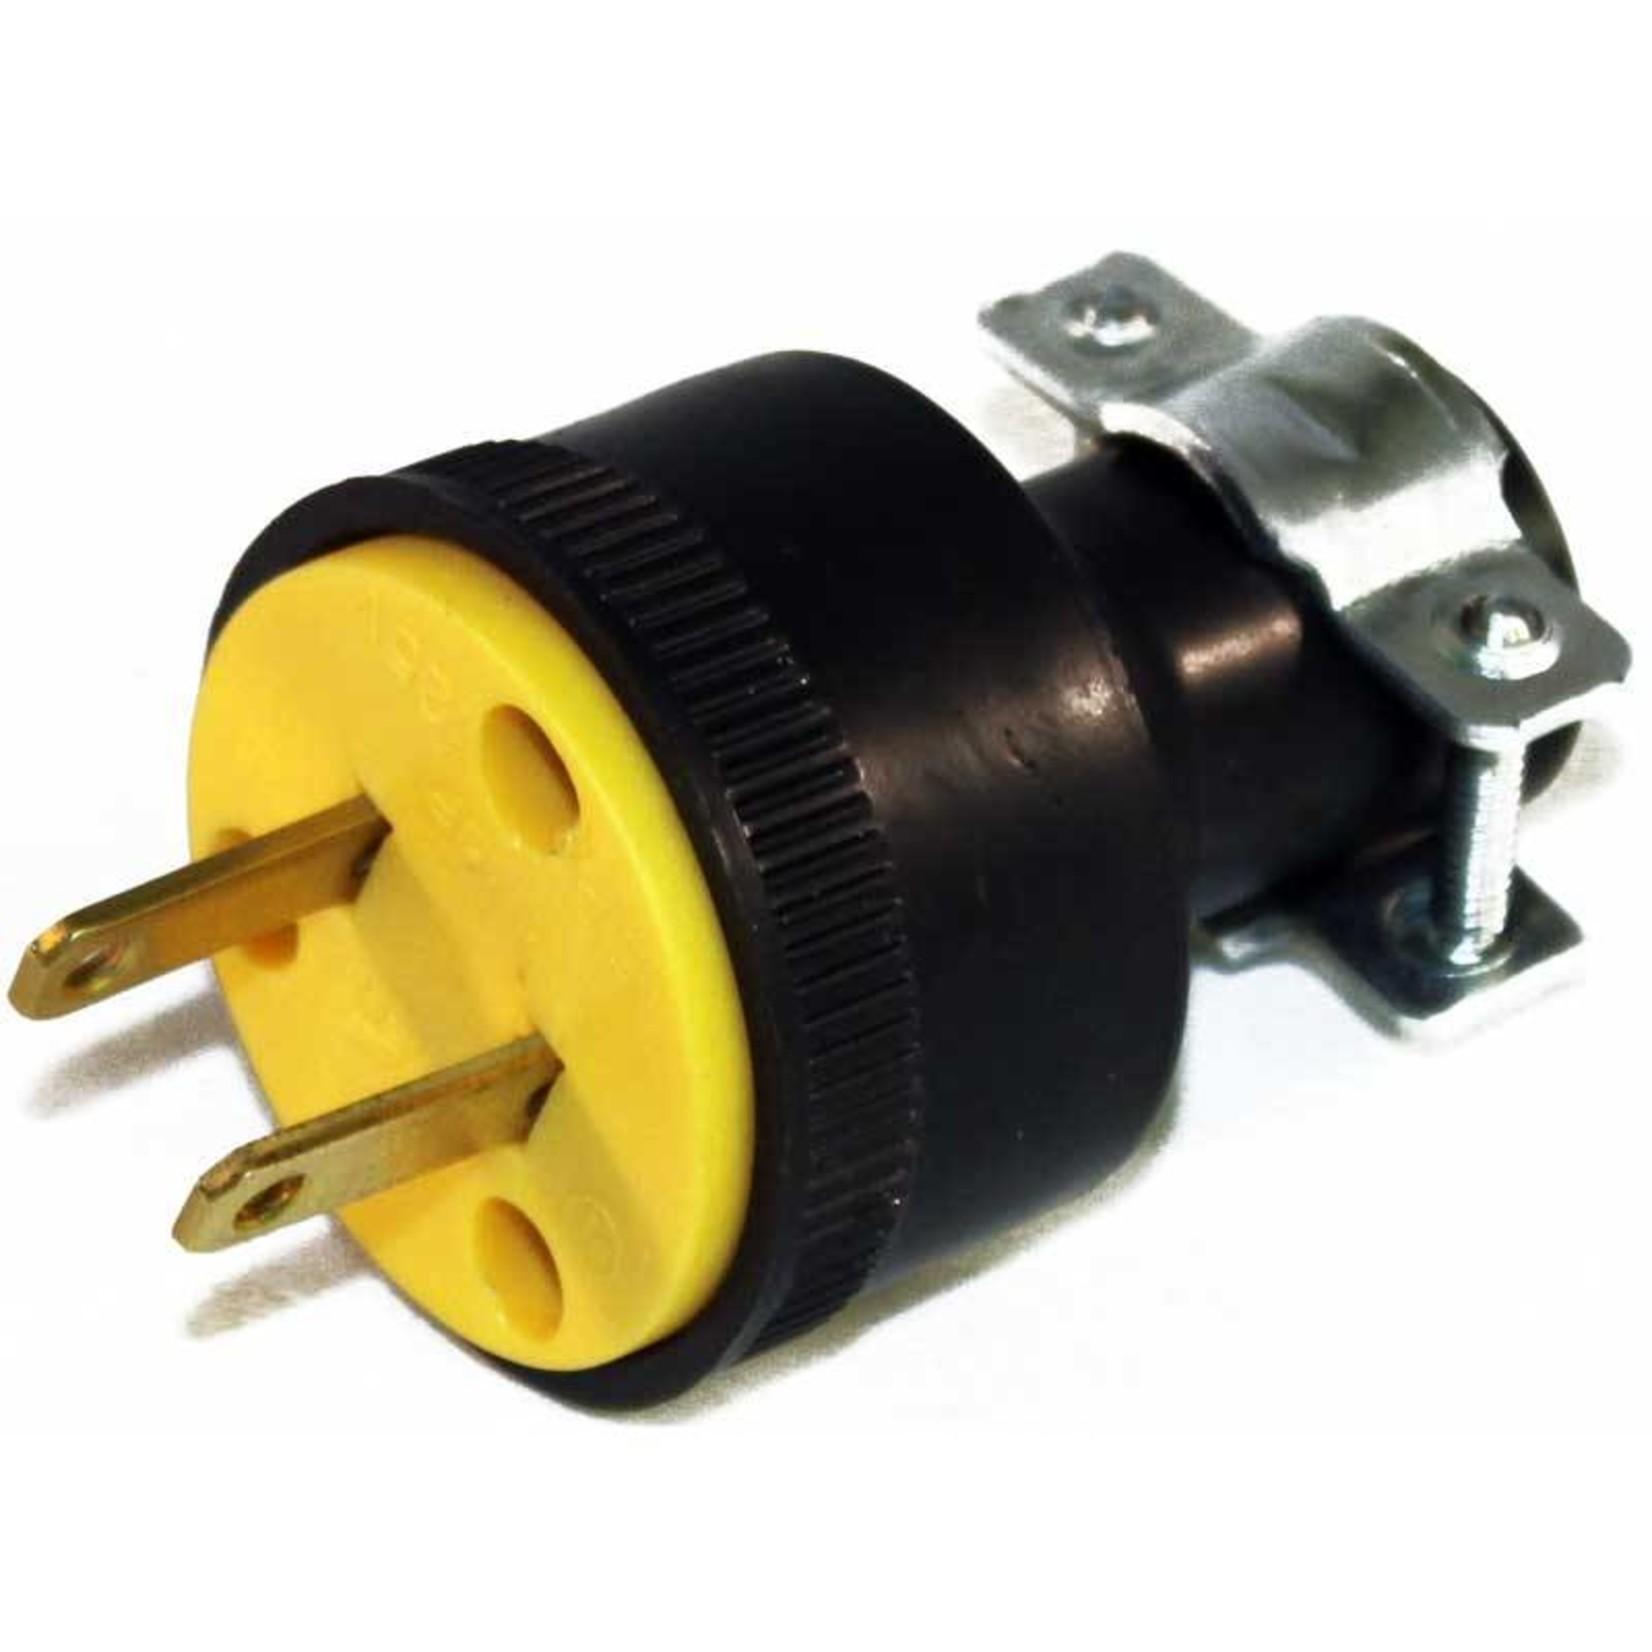 Generic 2 Wire Round Male Plug w/ Clamp - Rubber